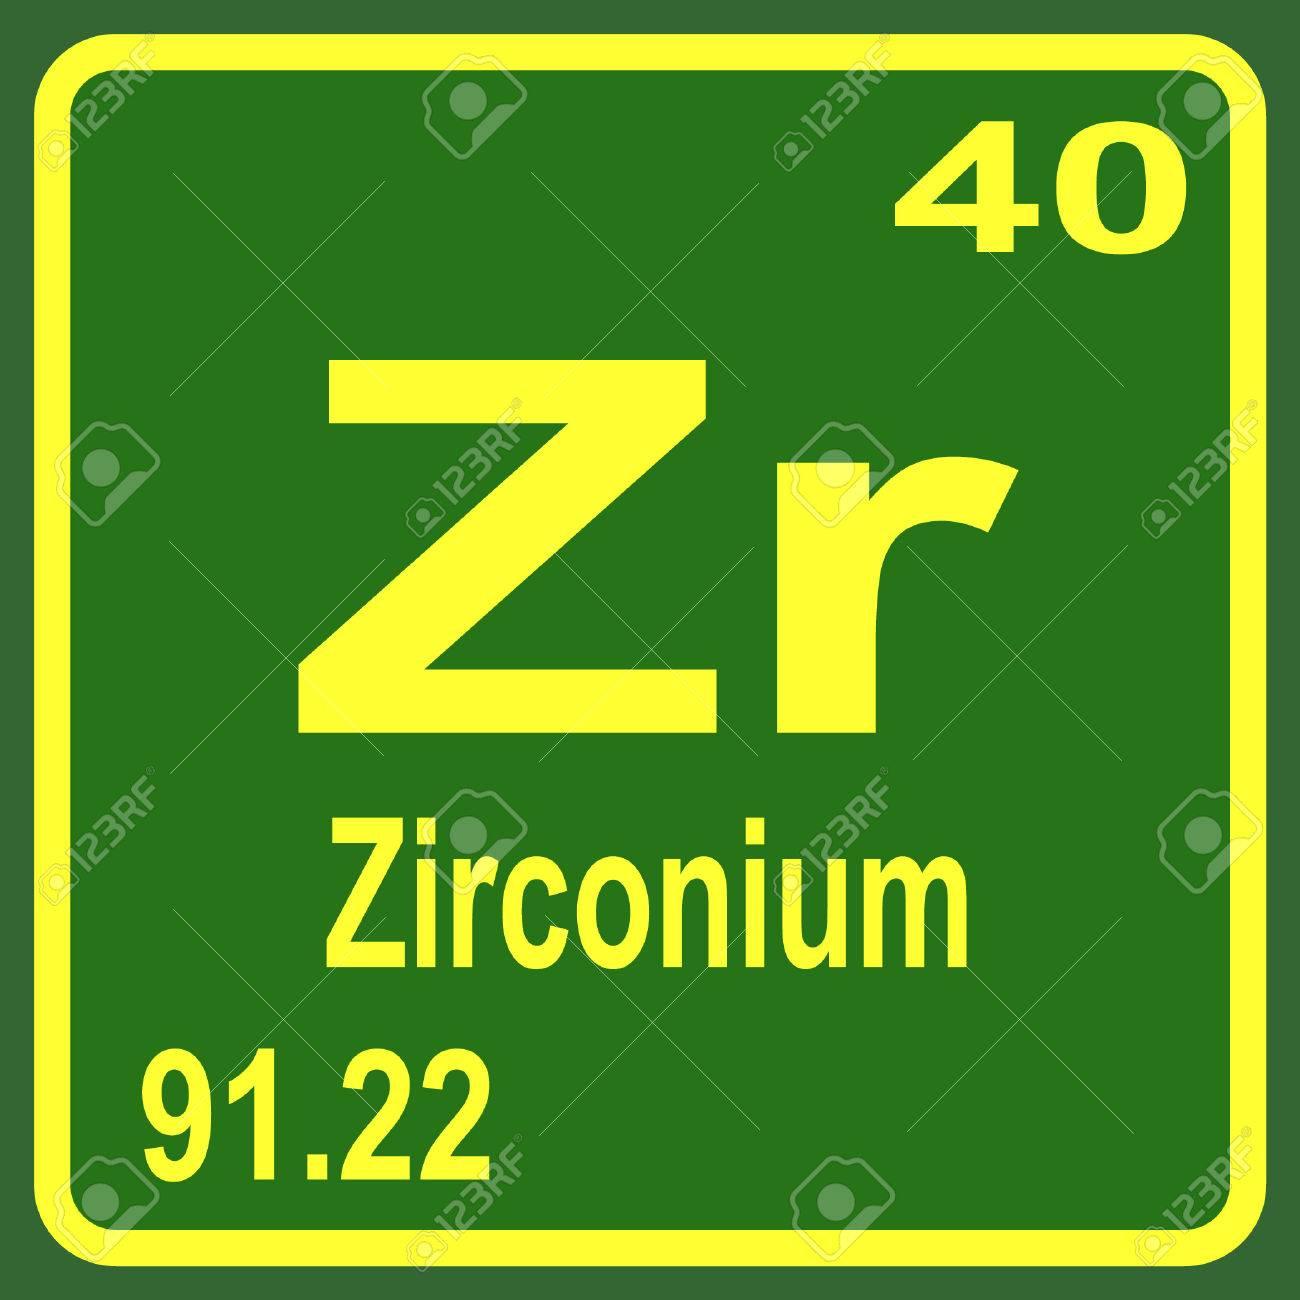 Periodic table of elements zirconium royalty free cliparts periodic table of elements zirconium stock vector 53901643 urtaz Images